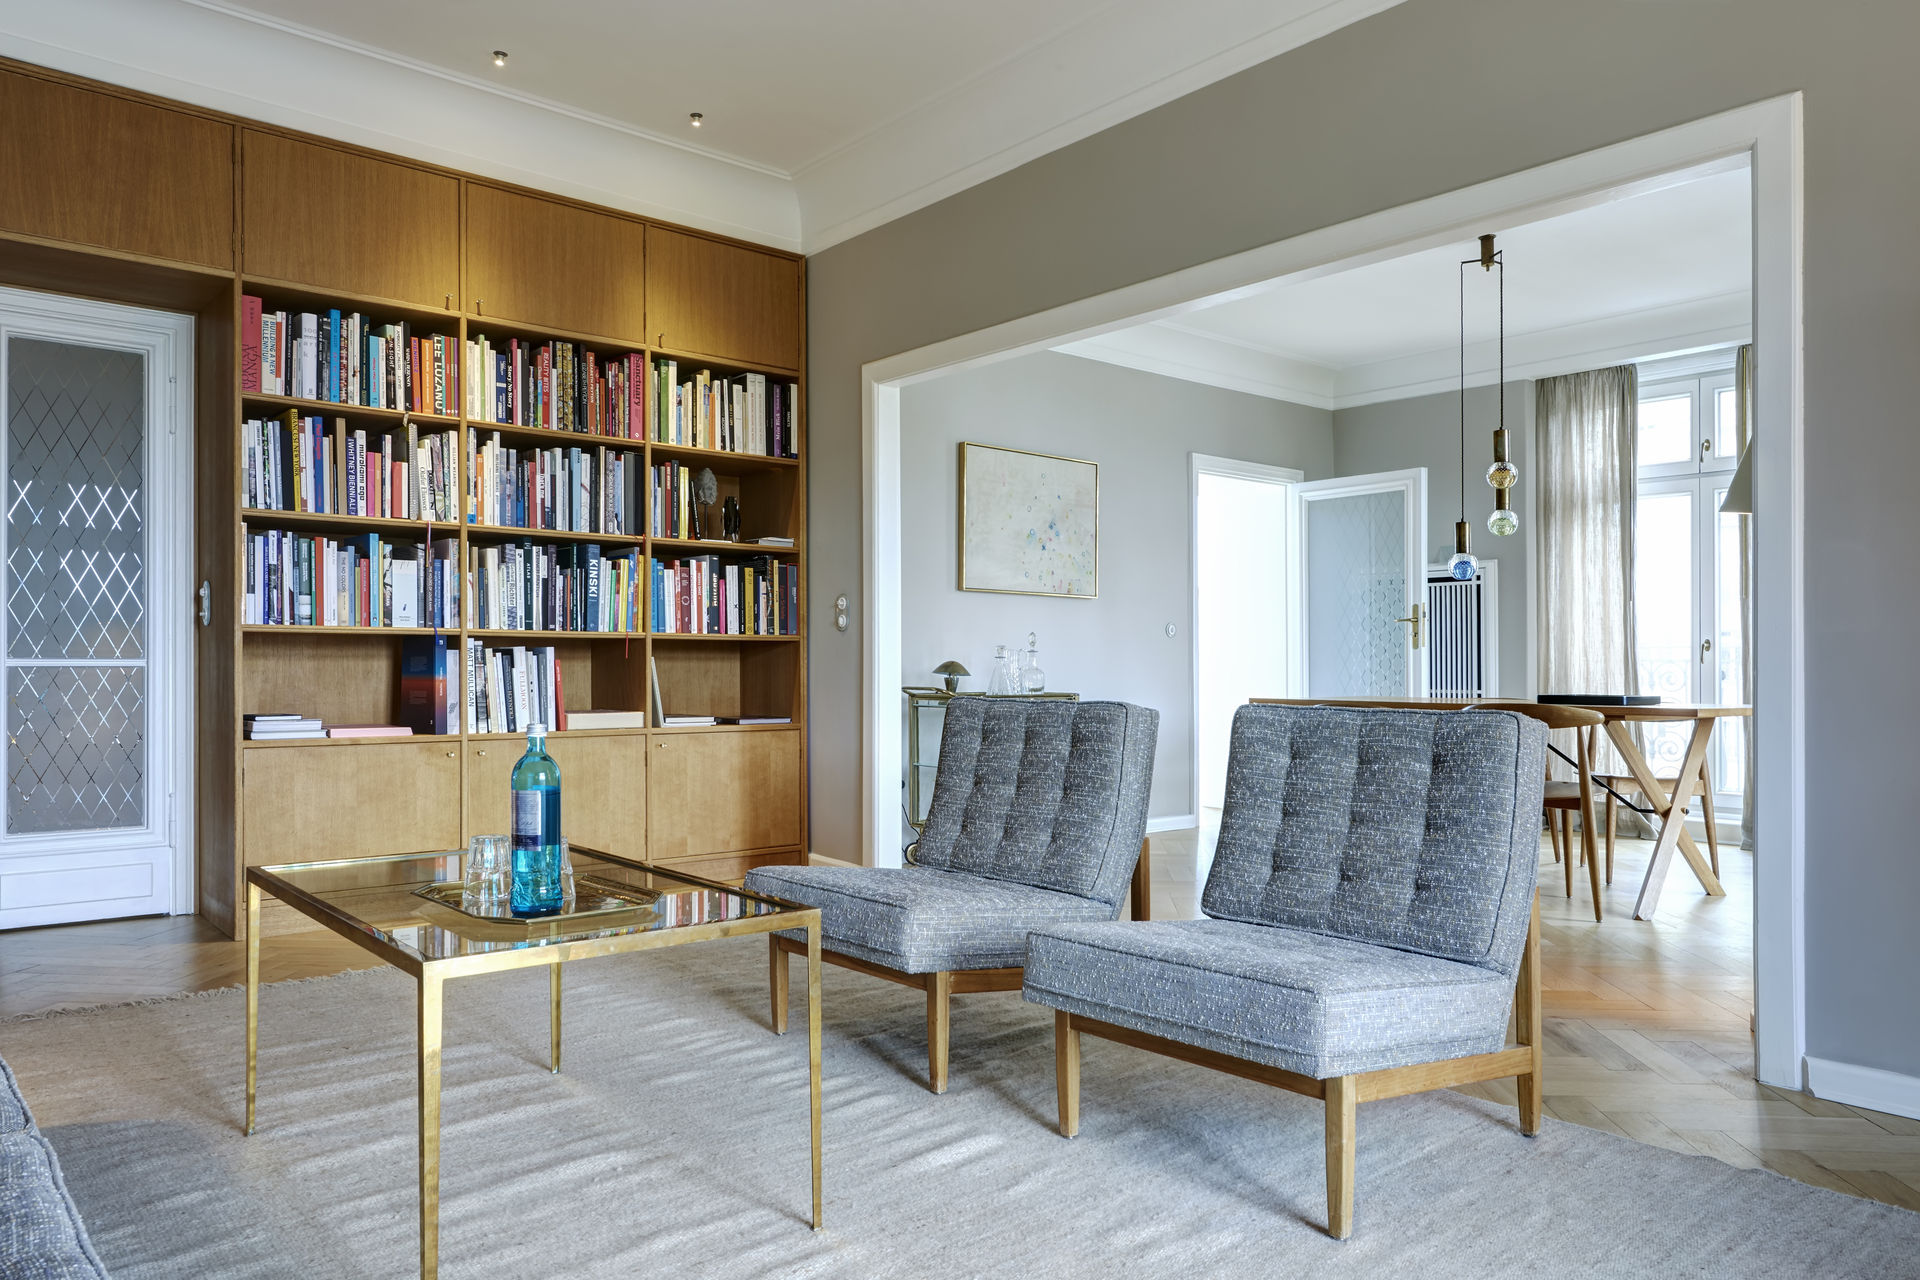 Design apartment am strausberger platz farawayhome for Apartments maison am olivaer platz